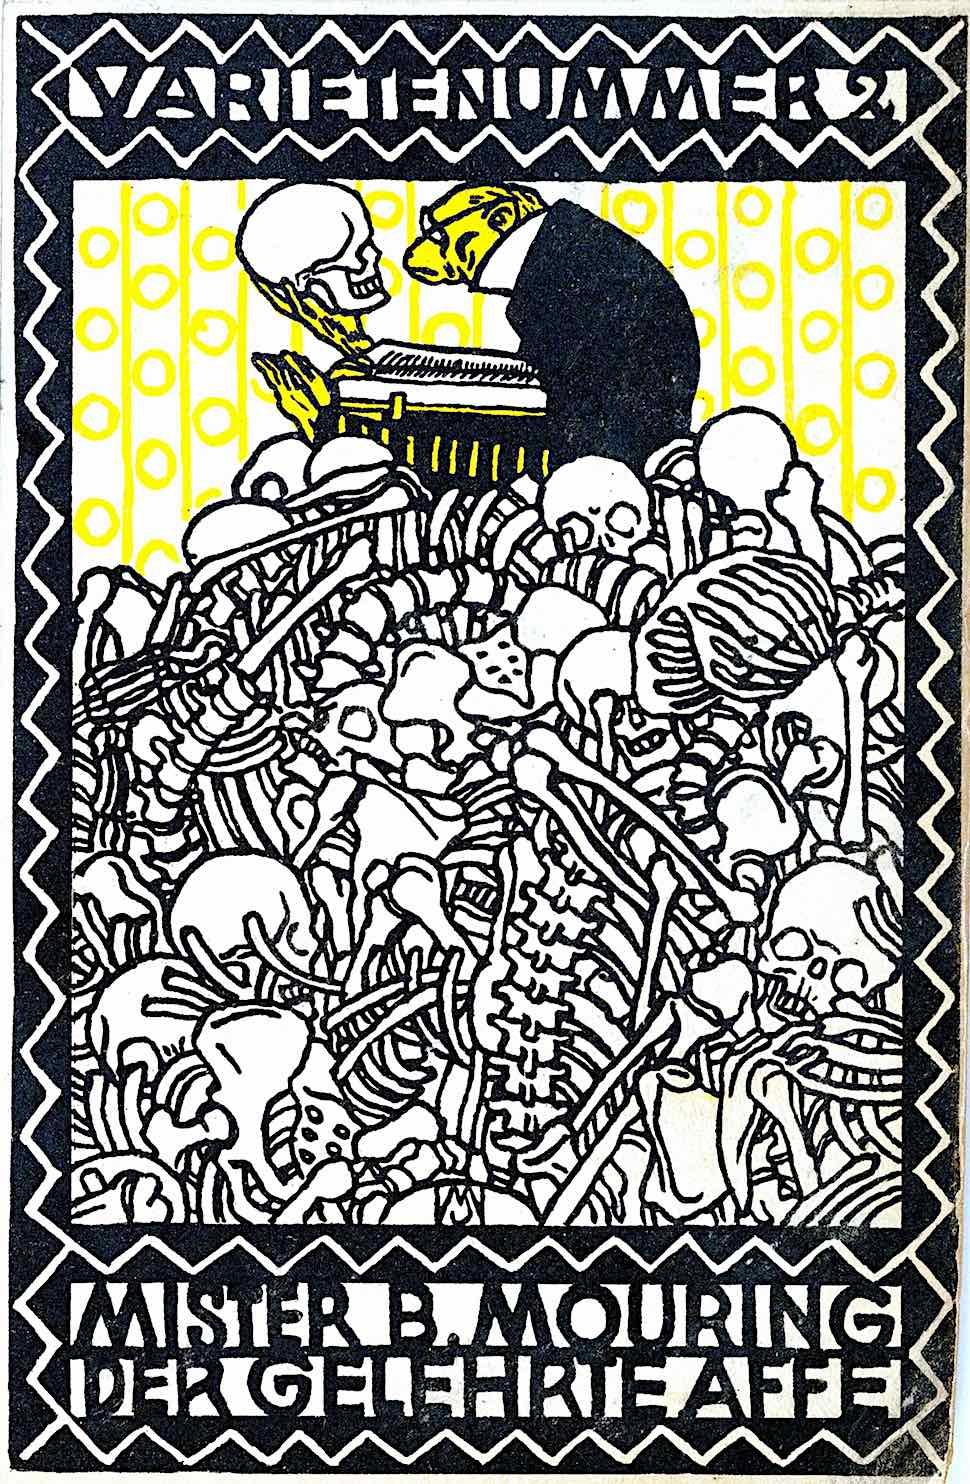 a card from the Wiener Werkstätte, Mister B. Mouring Der Gelehrte Affe, an educated yellow monkey is inspecting human skulls